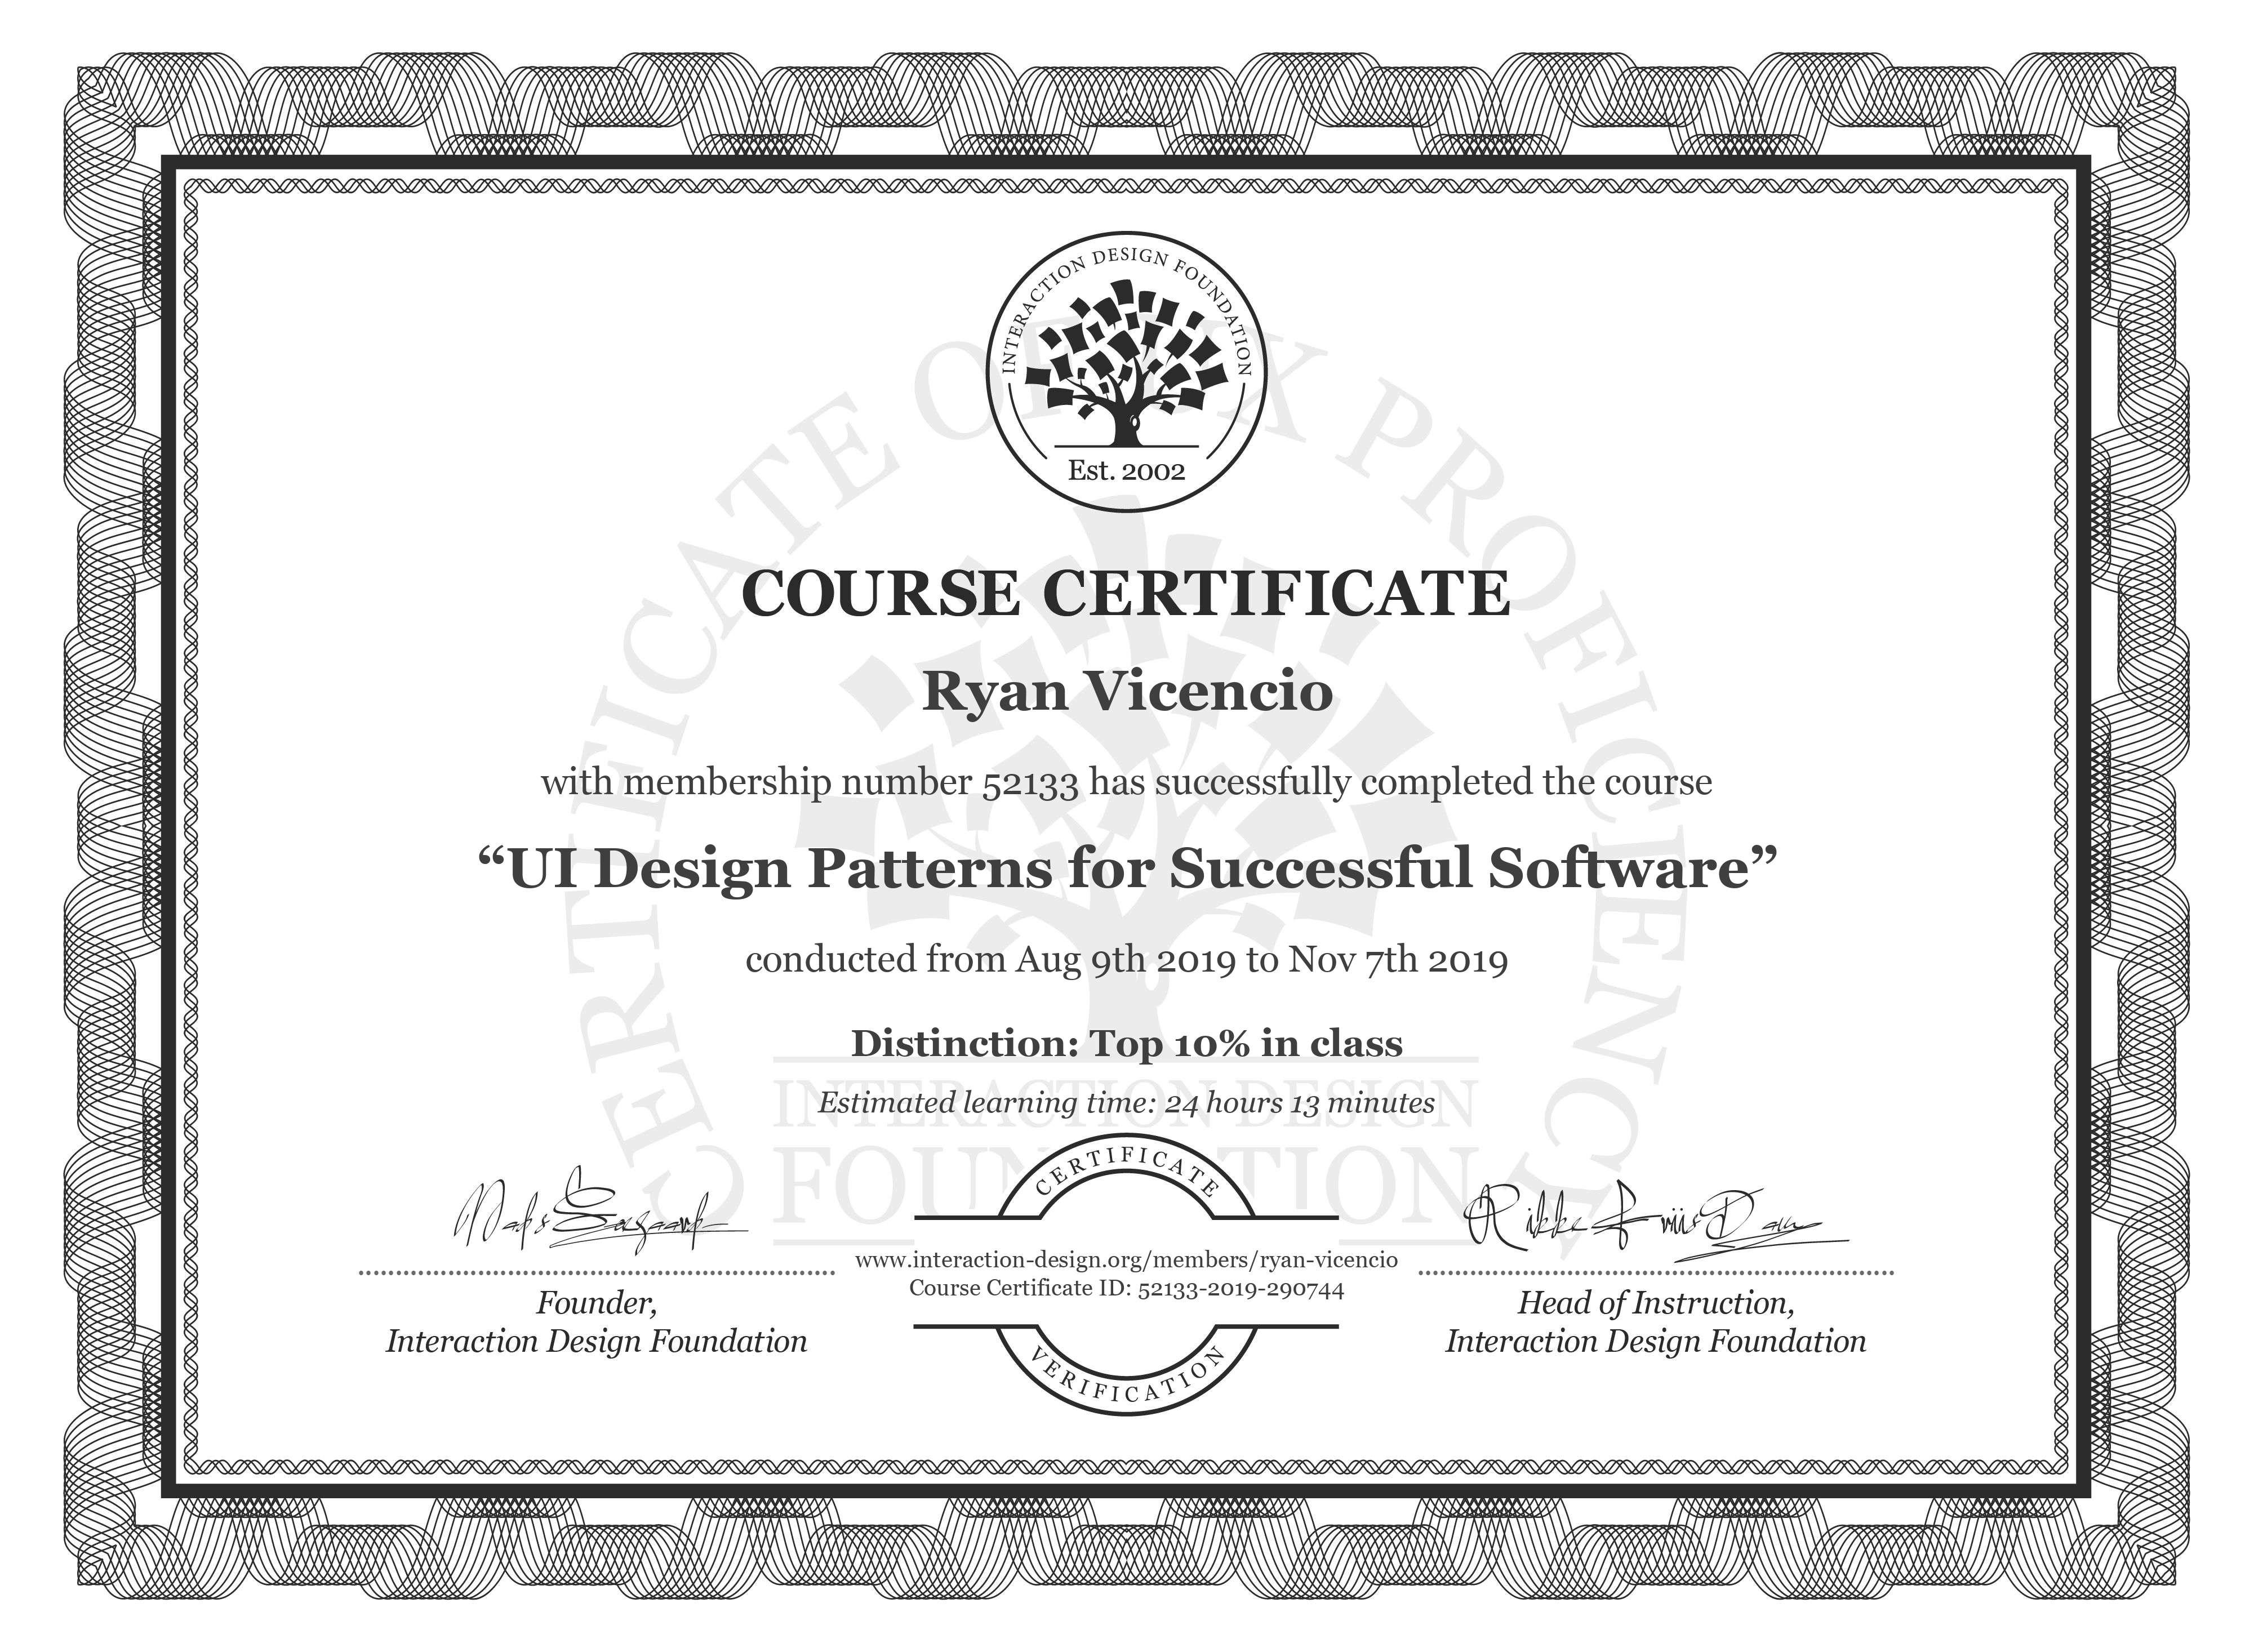 Ryan Vicencio's Course Certificate: UI Design Patterns for Successful Software